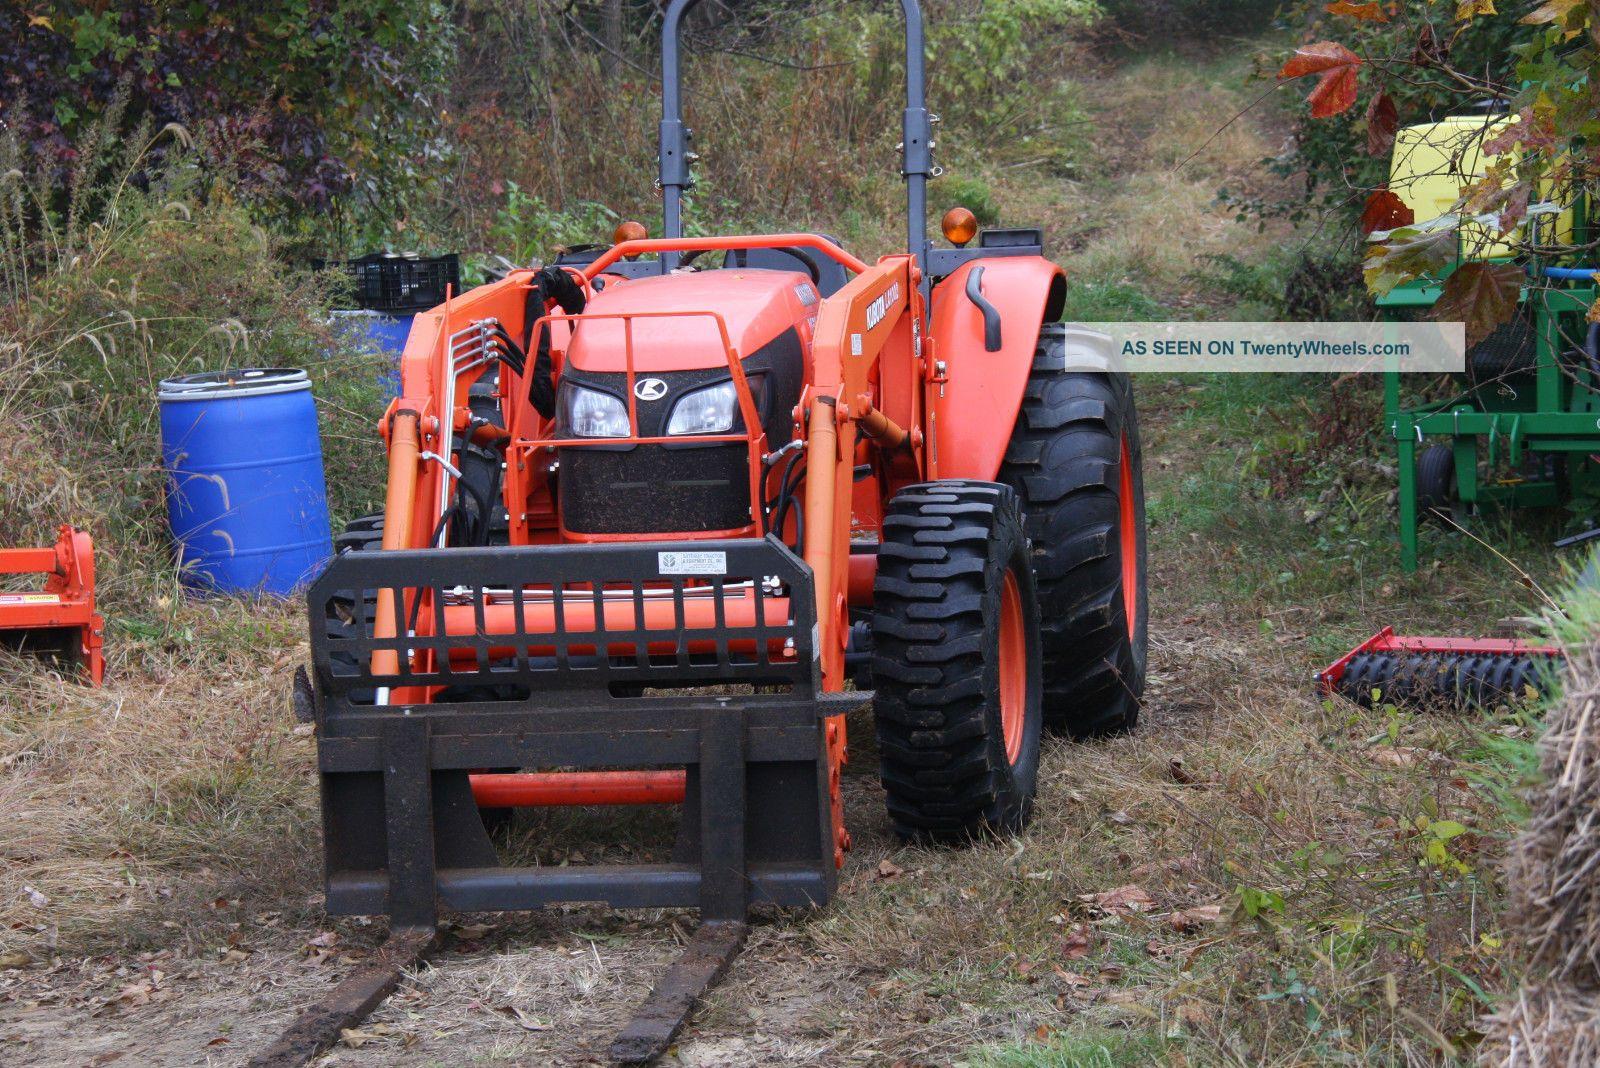 2012 Kubota M5640 Sud 4wd Tractor W Bucket, Pallet Forks